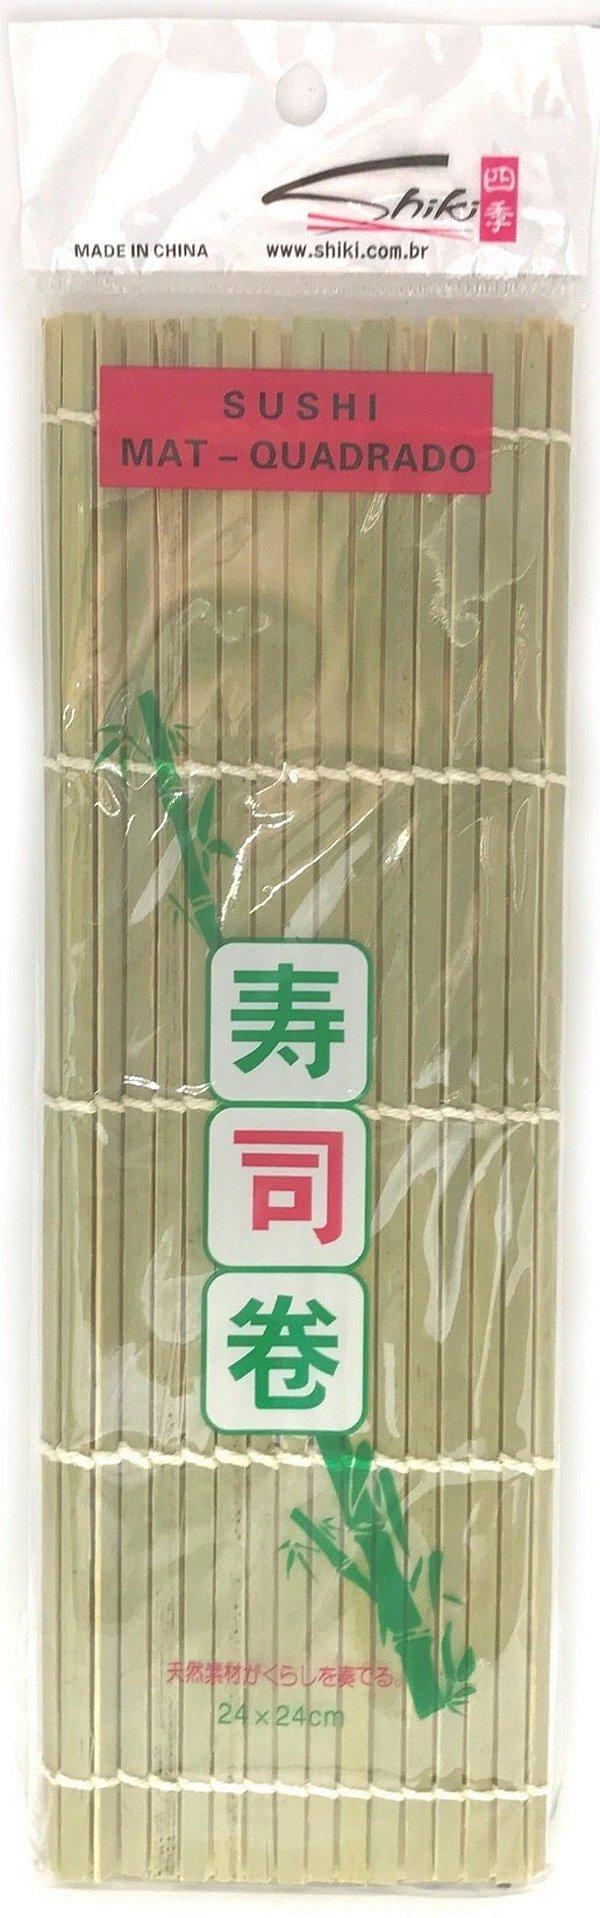 Esteira para Sushi de Bambu Sudare